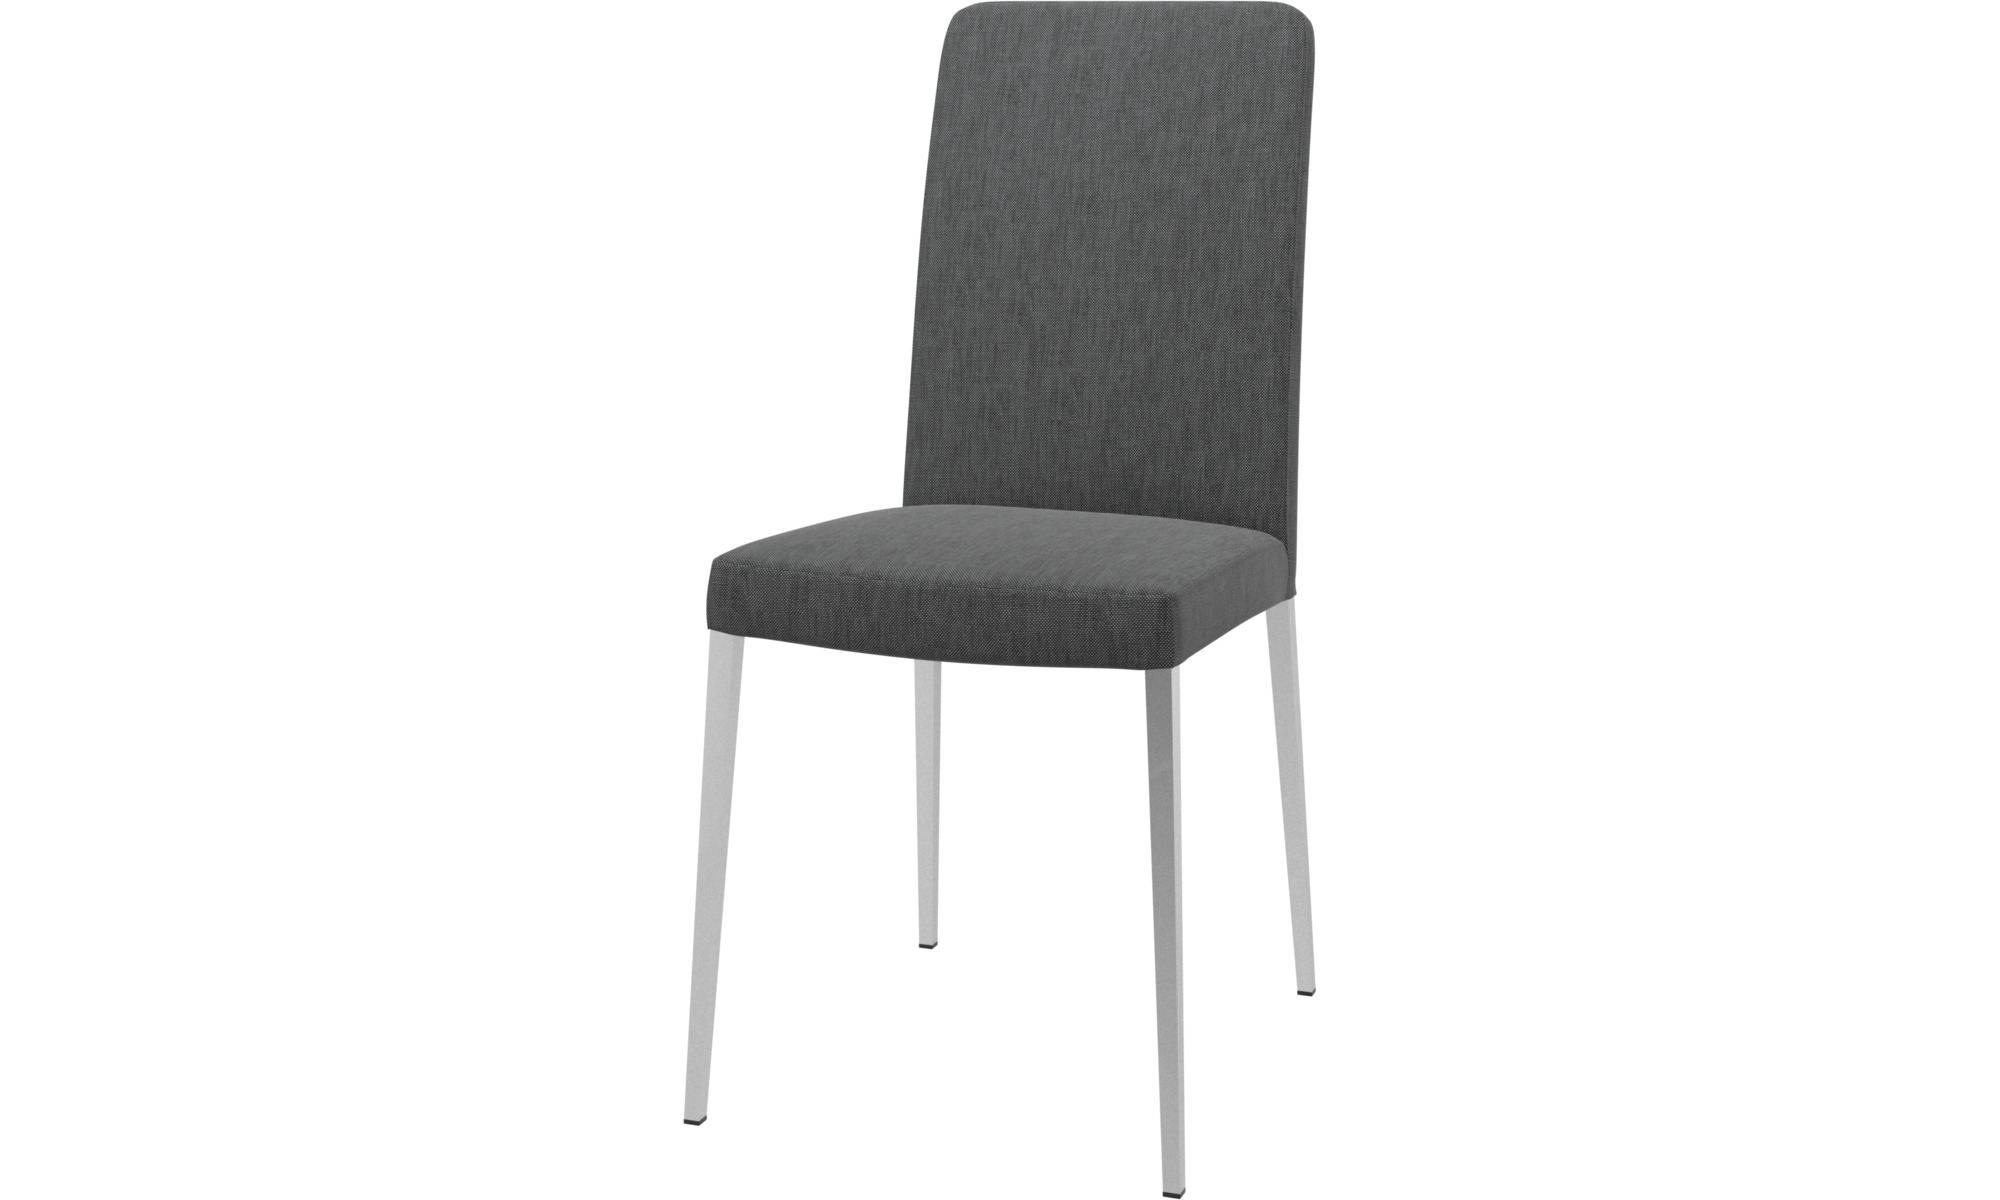 Cadeiras de jantar - Cadeira Nico - Cinza - Tecido